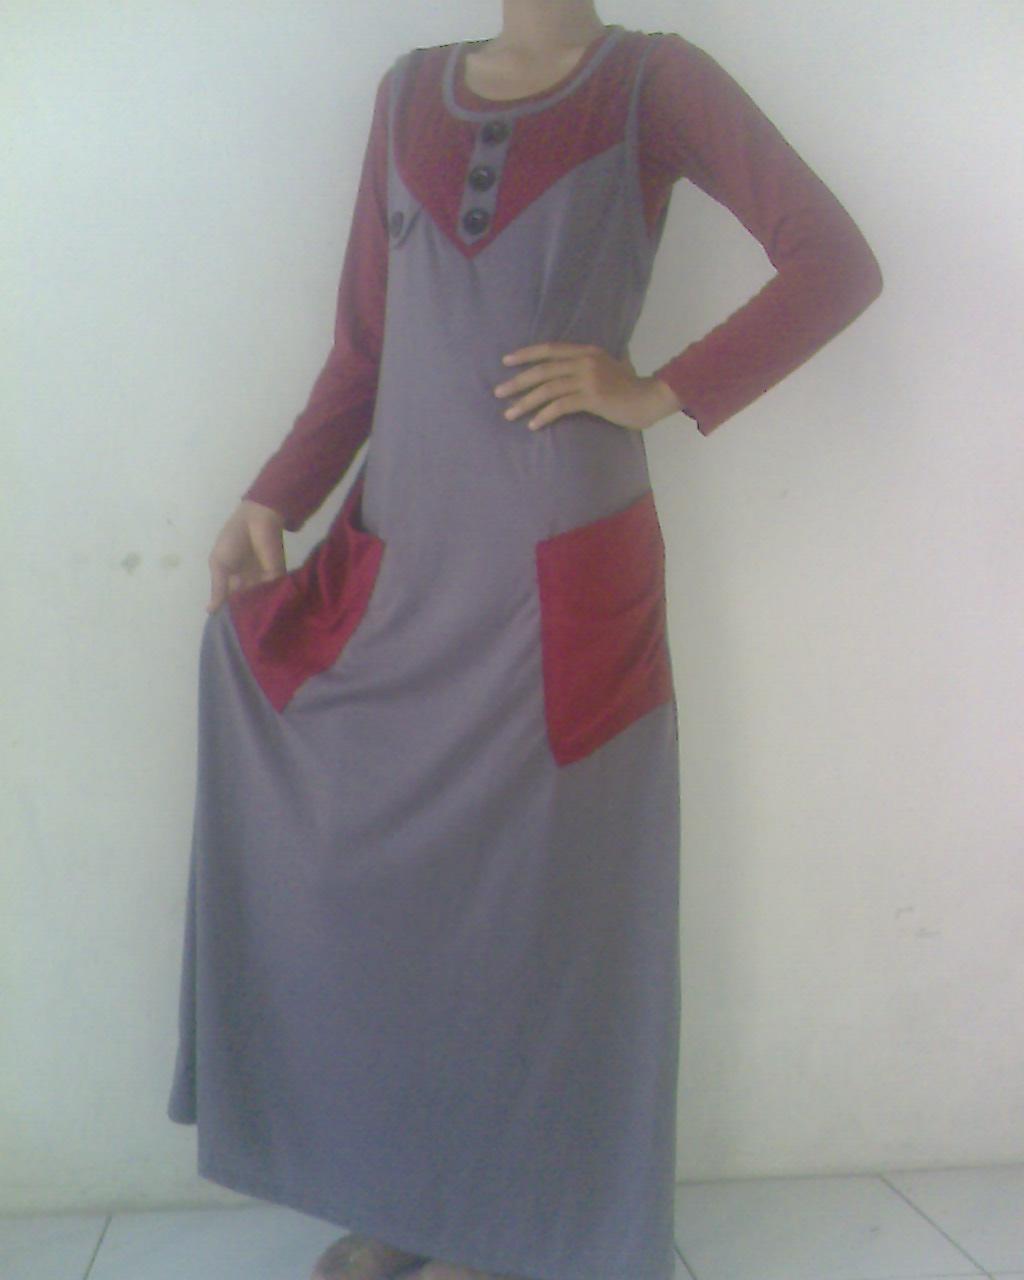 Harga Jubah Kaos Wanita Warna Pink Murah Di Surabaya Meyeyesshop